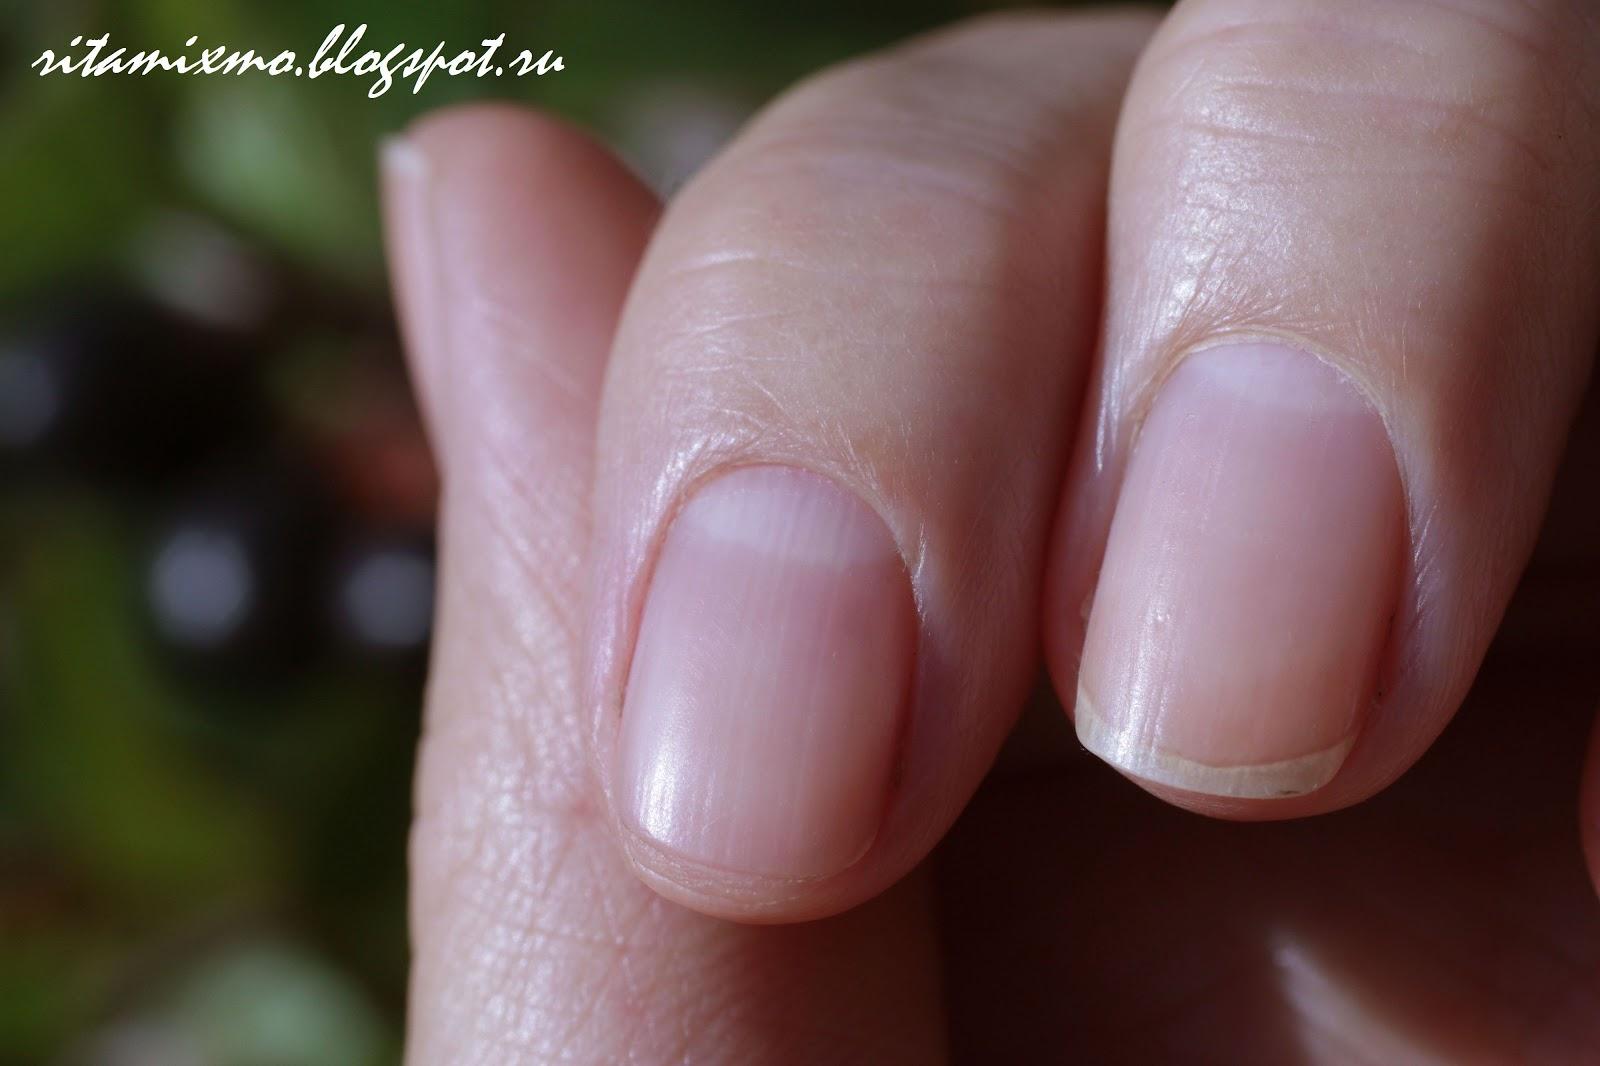 опухоль на пальце руки возле ногтя фото